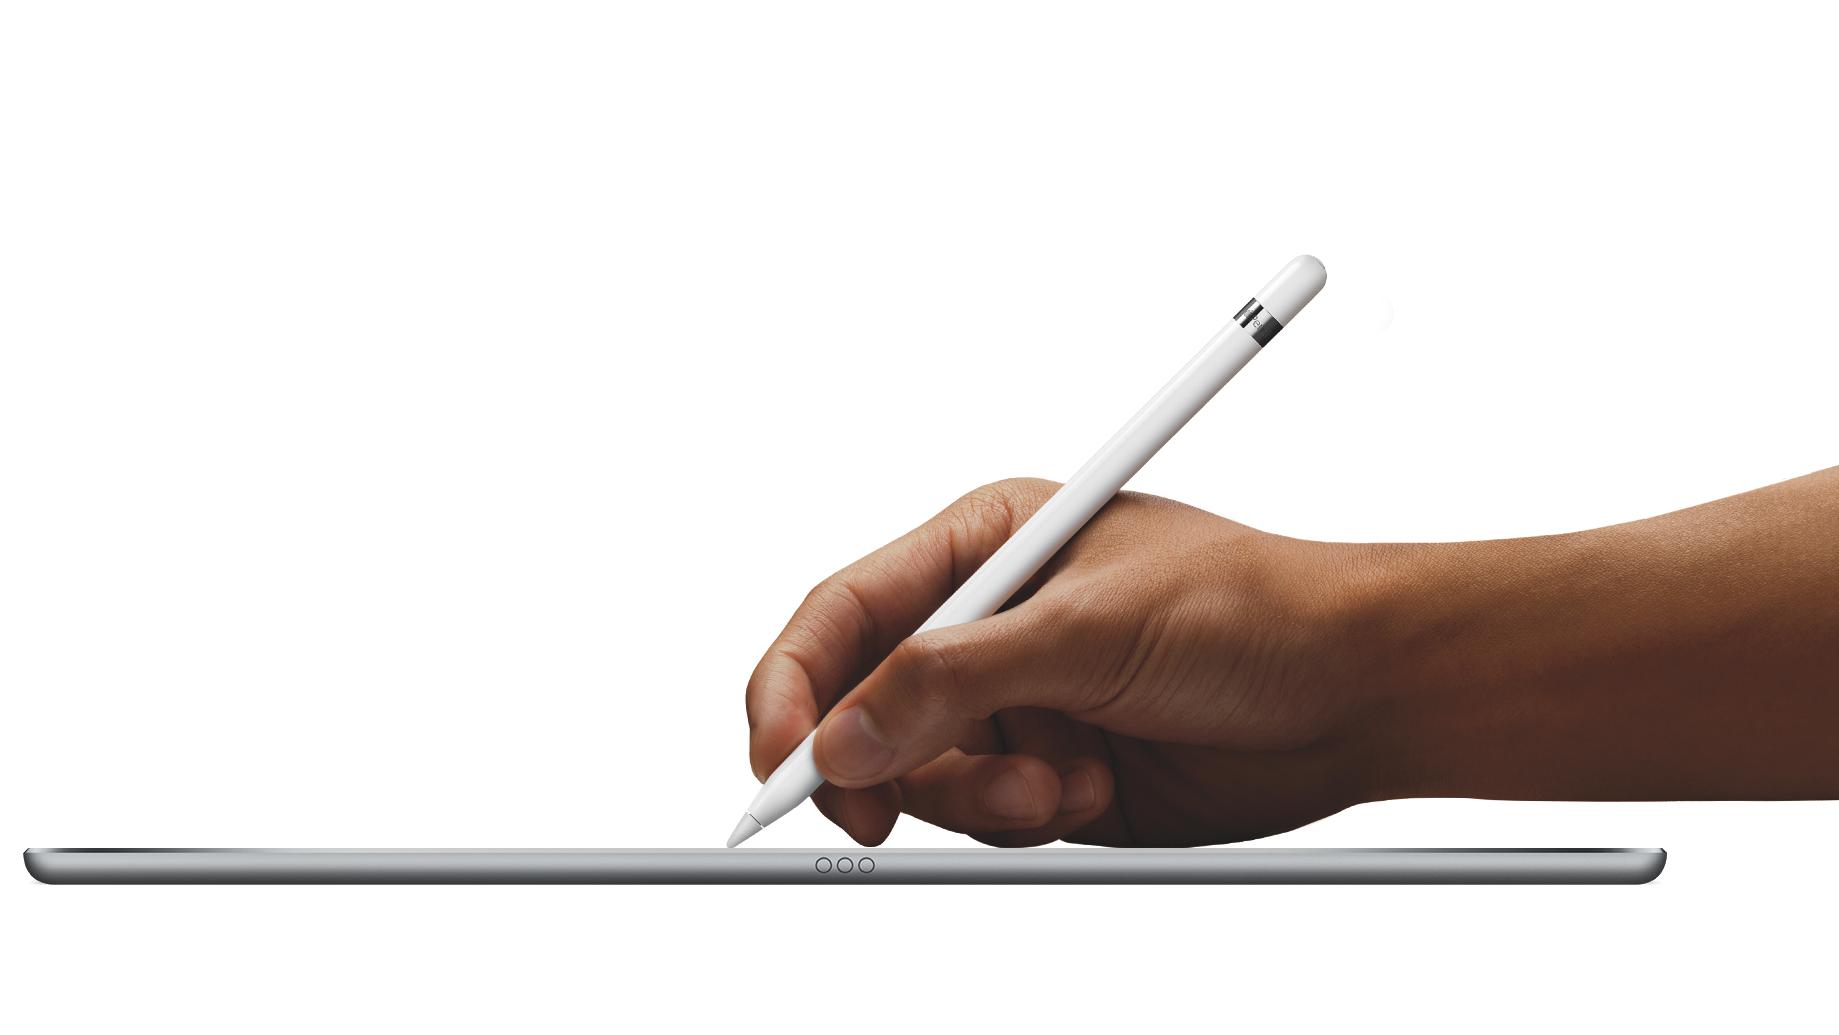 ipad-pro-stylus-16x9